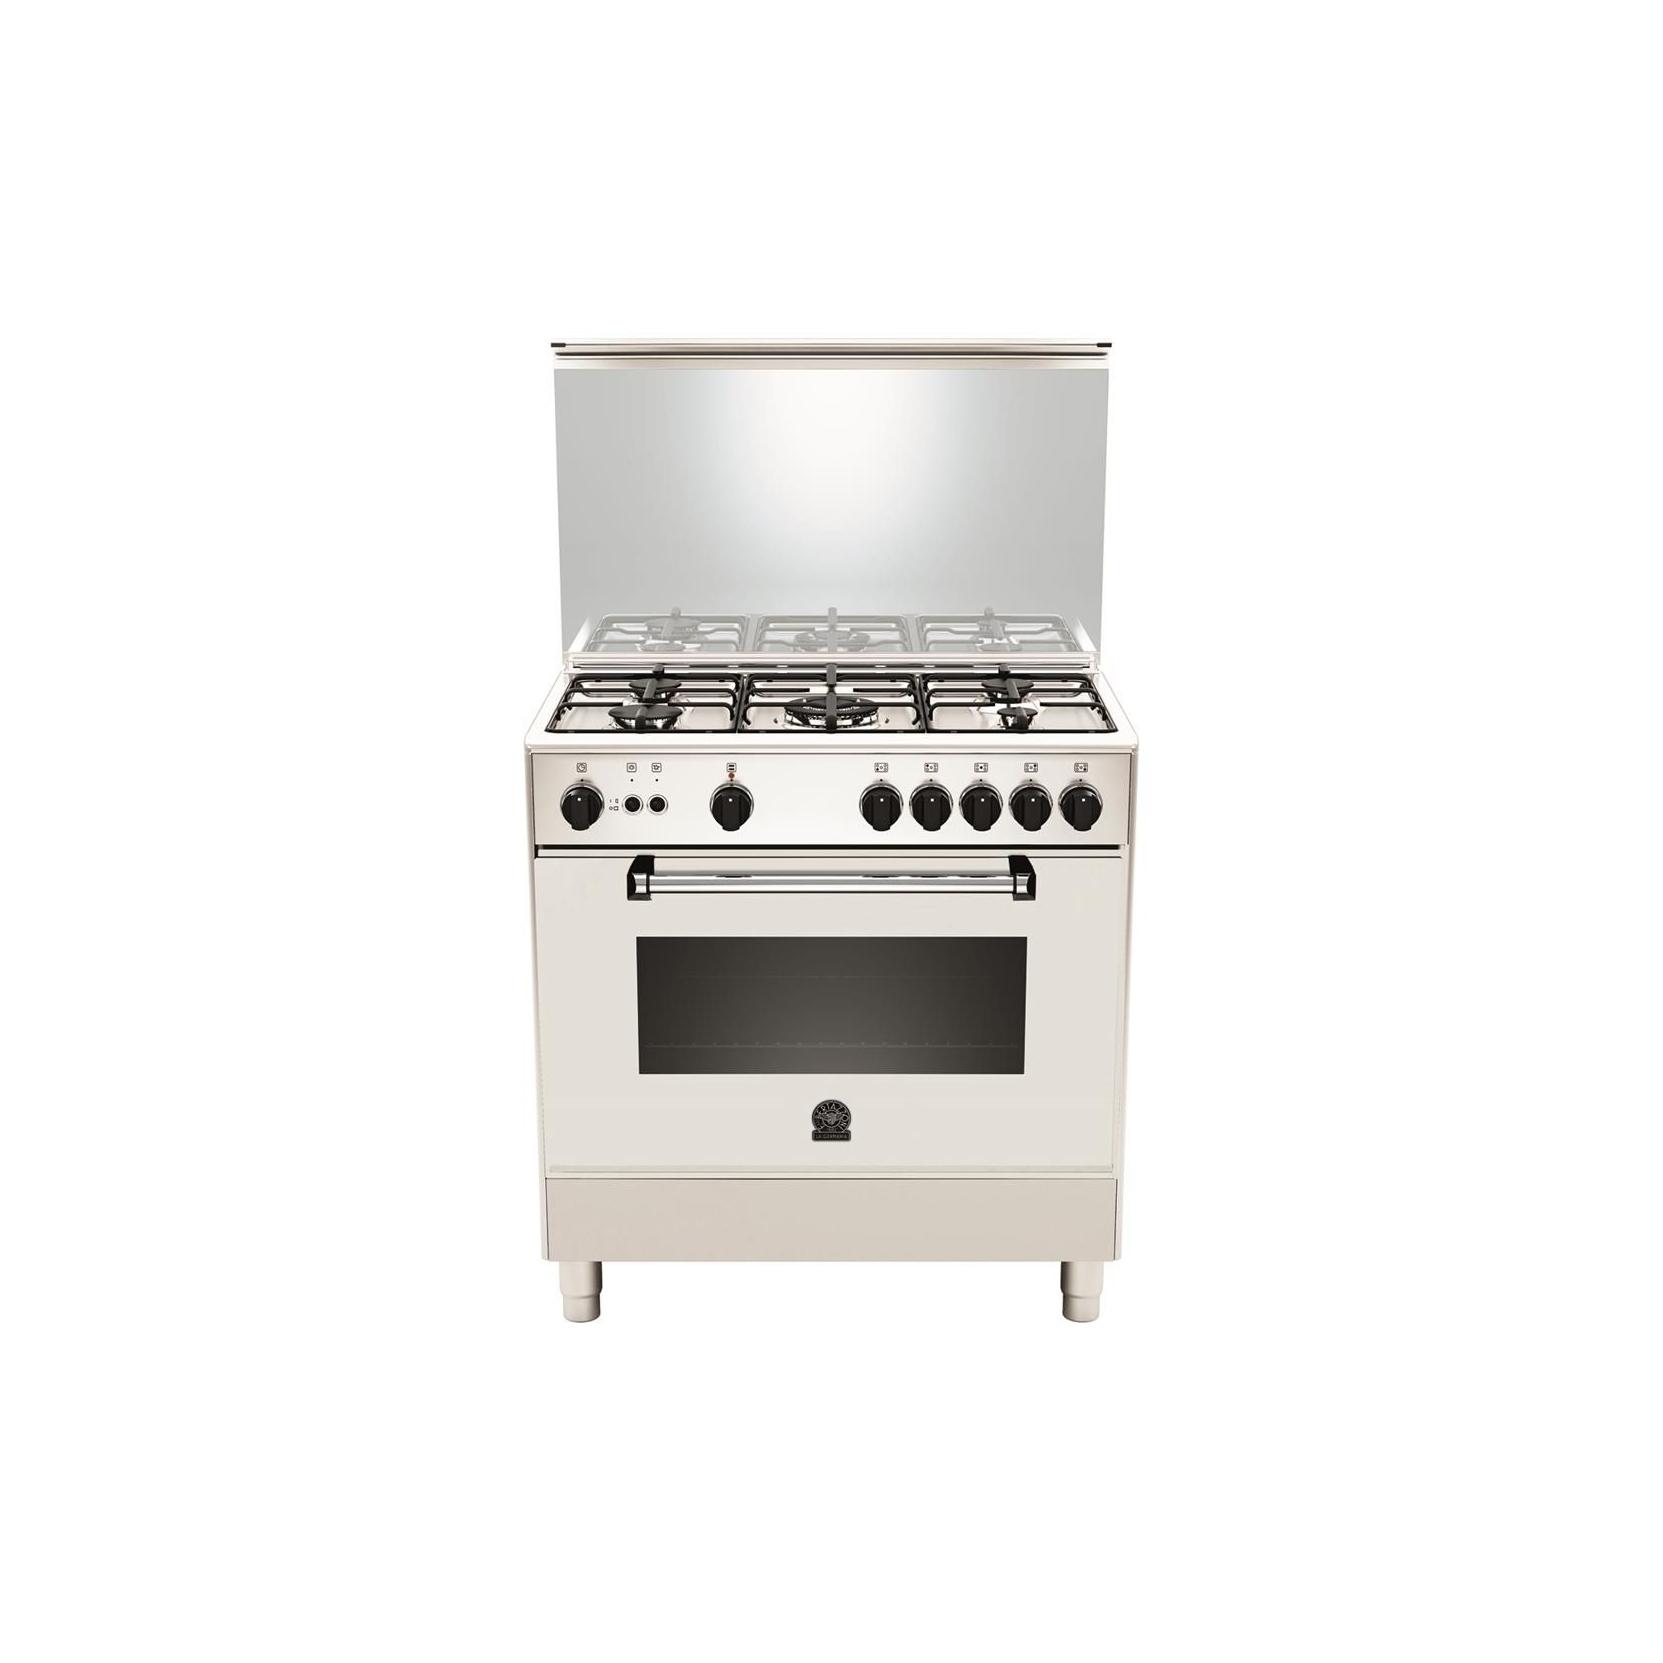 Cucine A Gas Smeg. Awesome Particolare With Cucine A Gas Smeg ...